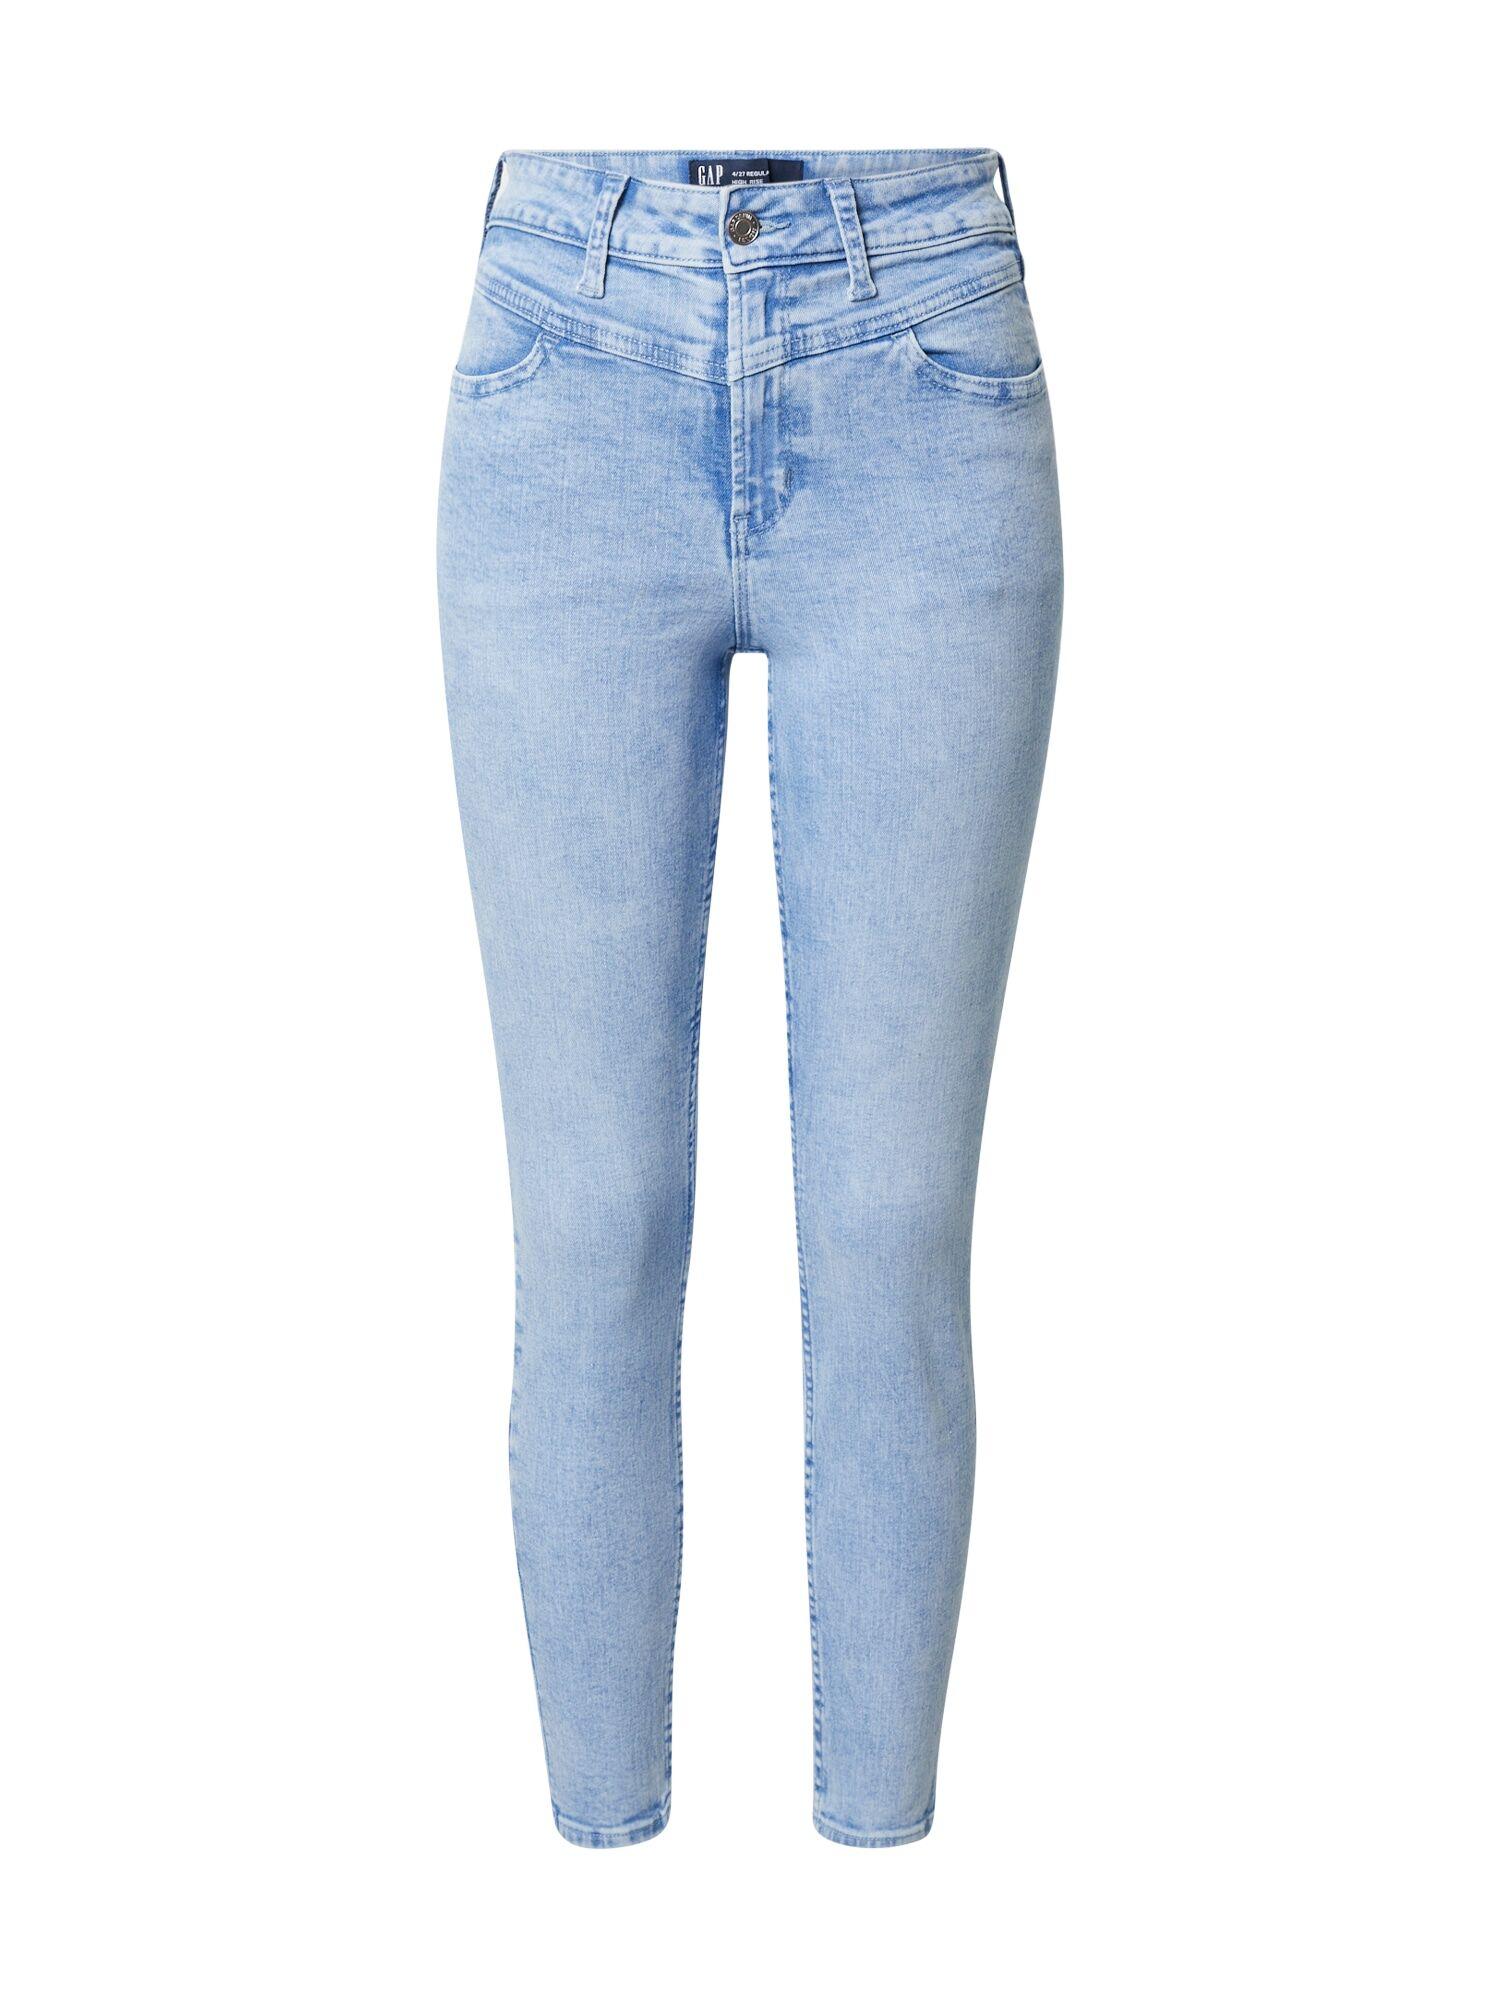 GAP Jean  - Bleu - Taille: 30 - female